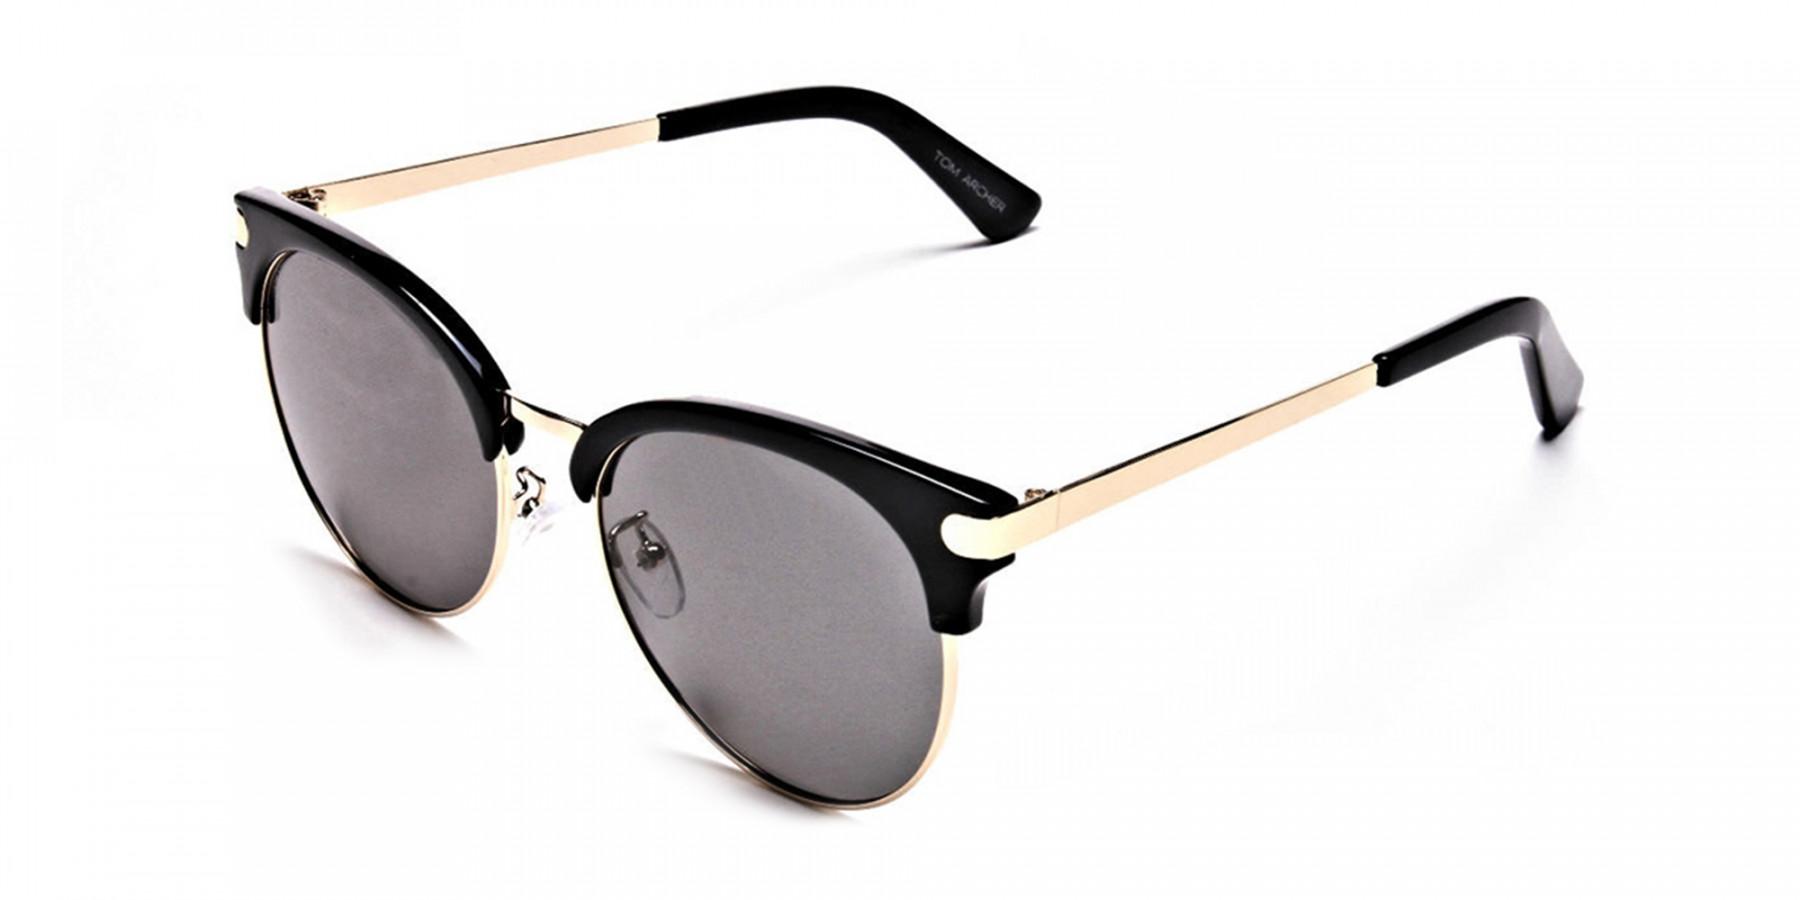 Gold Browline Sunglasses, Gold Eyeglasses -2